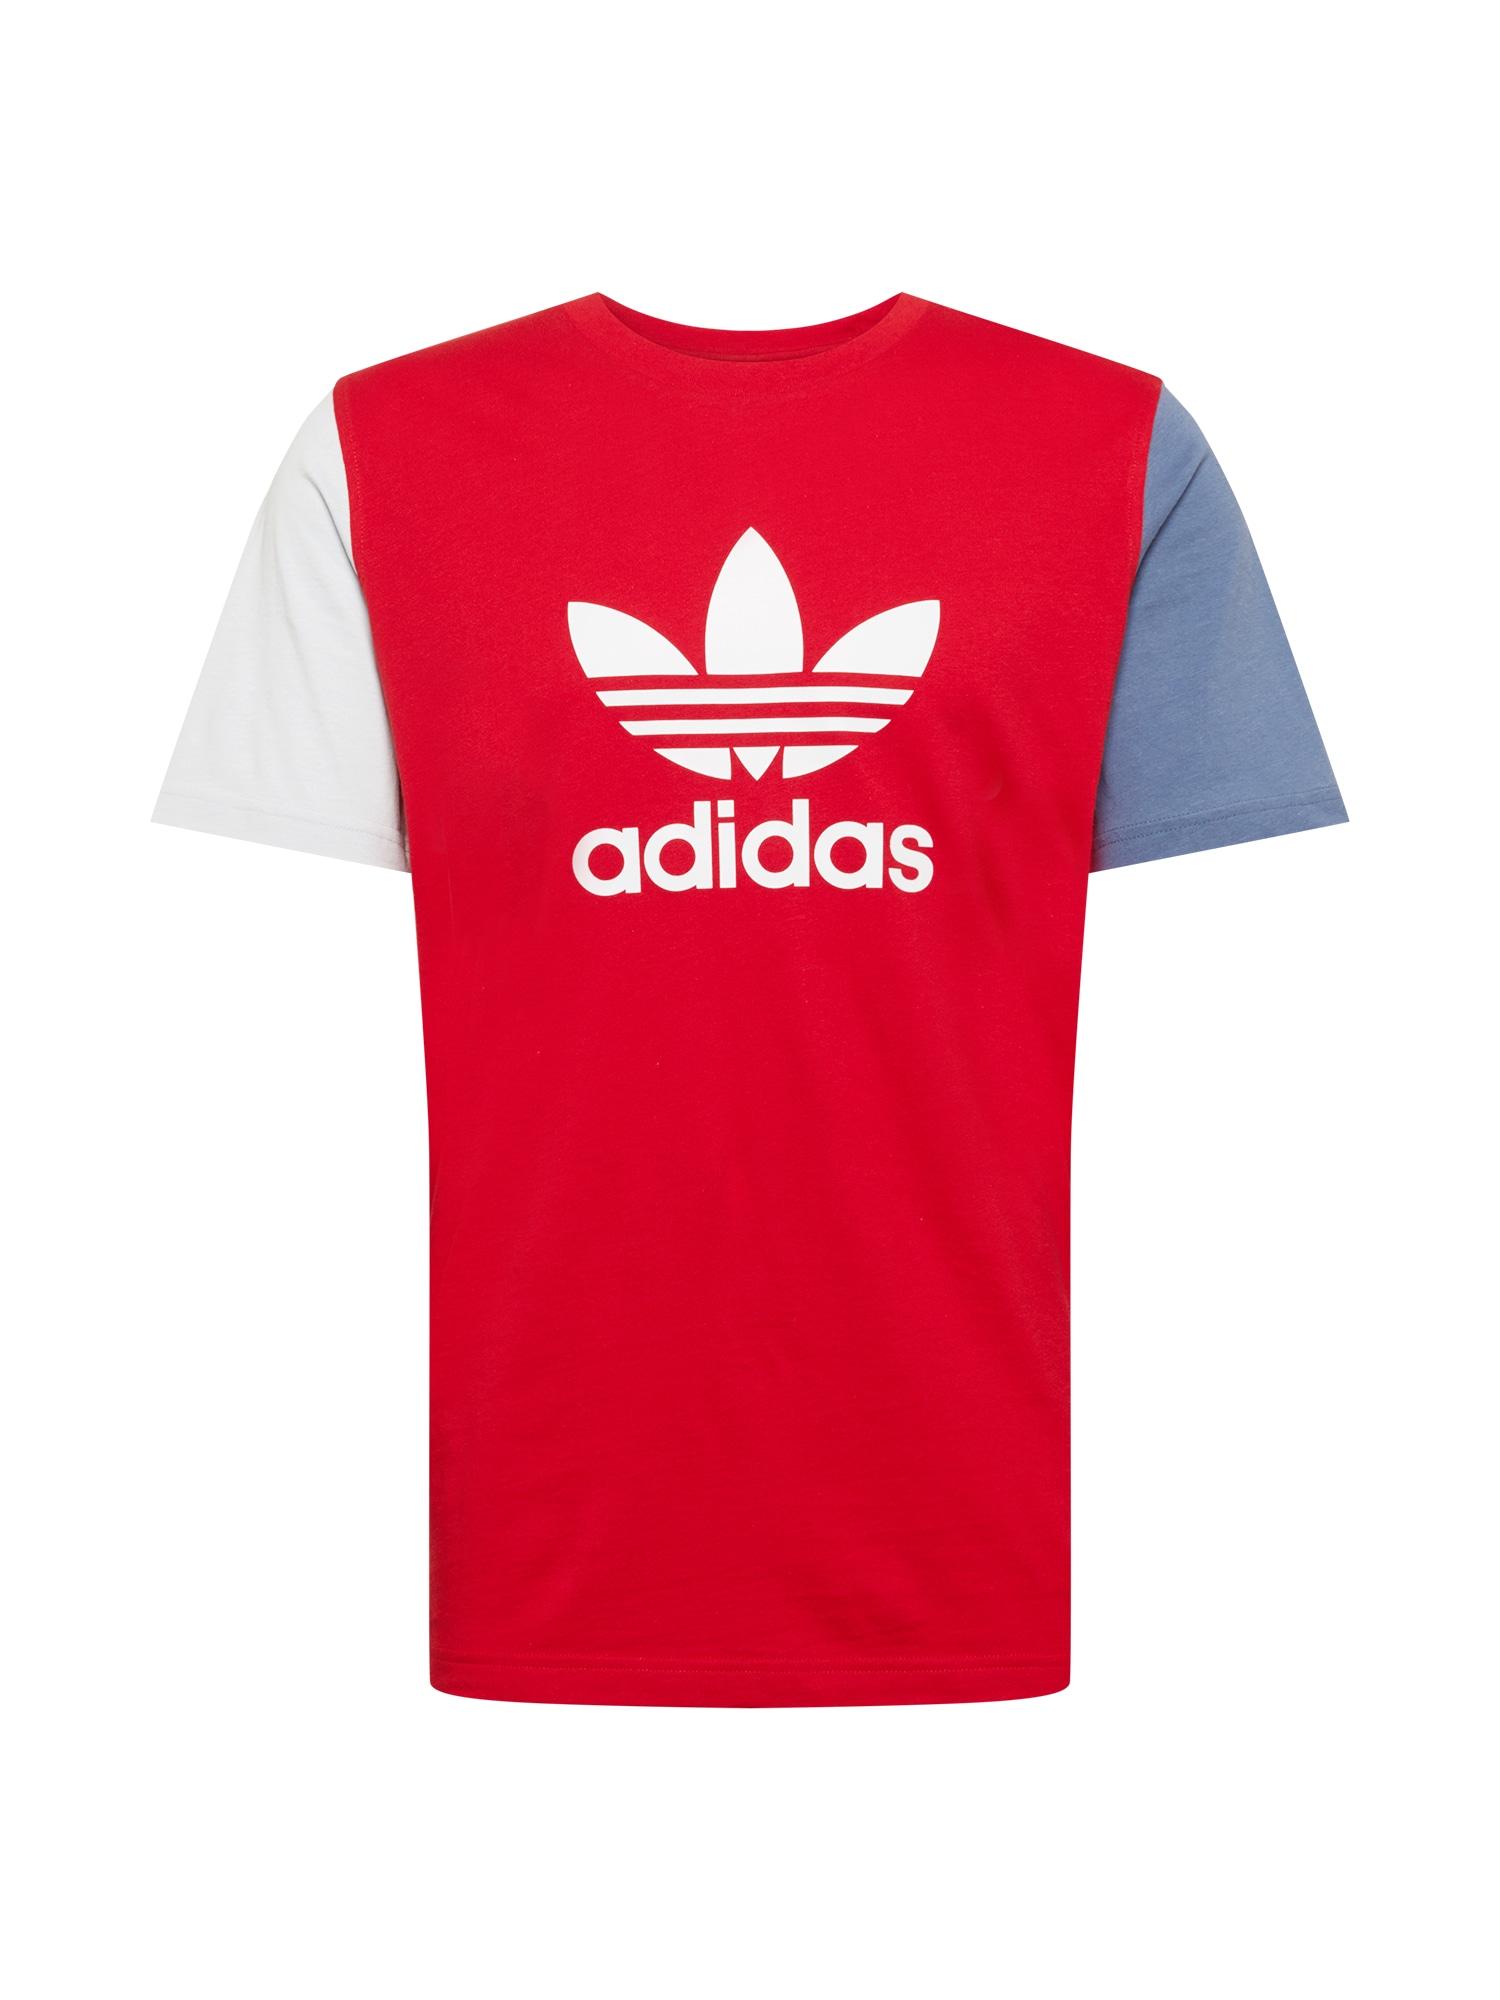 ADIDAS ORIGINALS Marškinėliai 'TREFOIL' raudona / balta / melsvai pilka